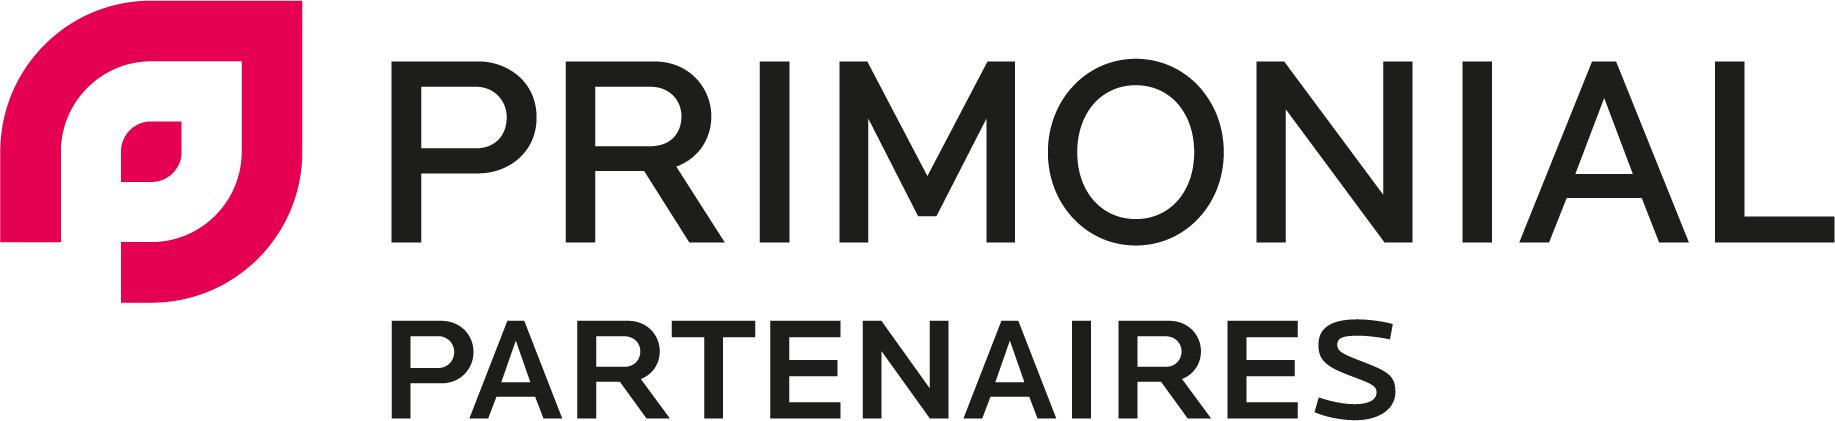 Primonial_partenaires-RVB